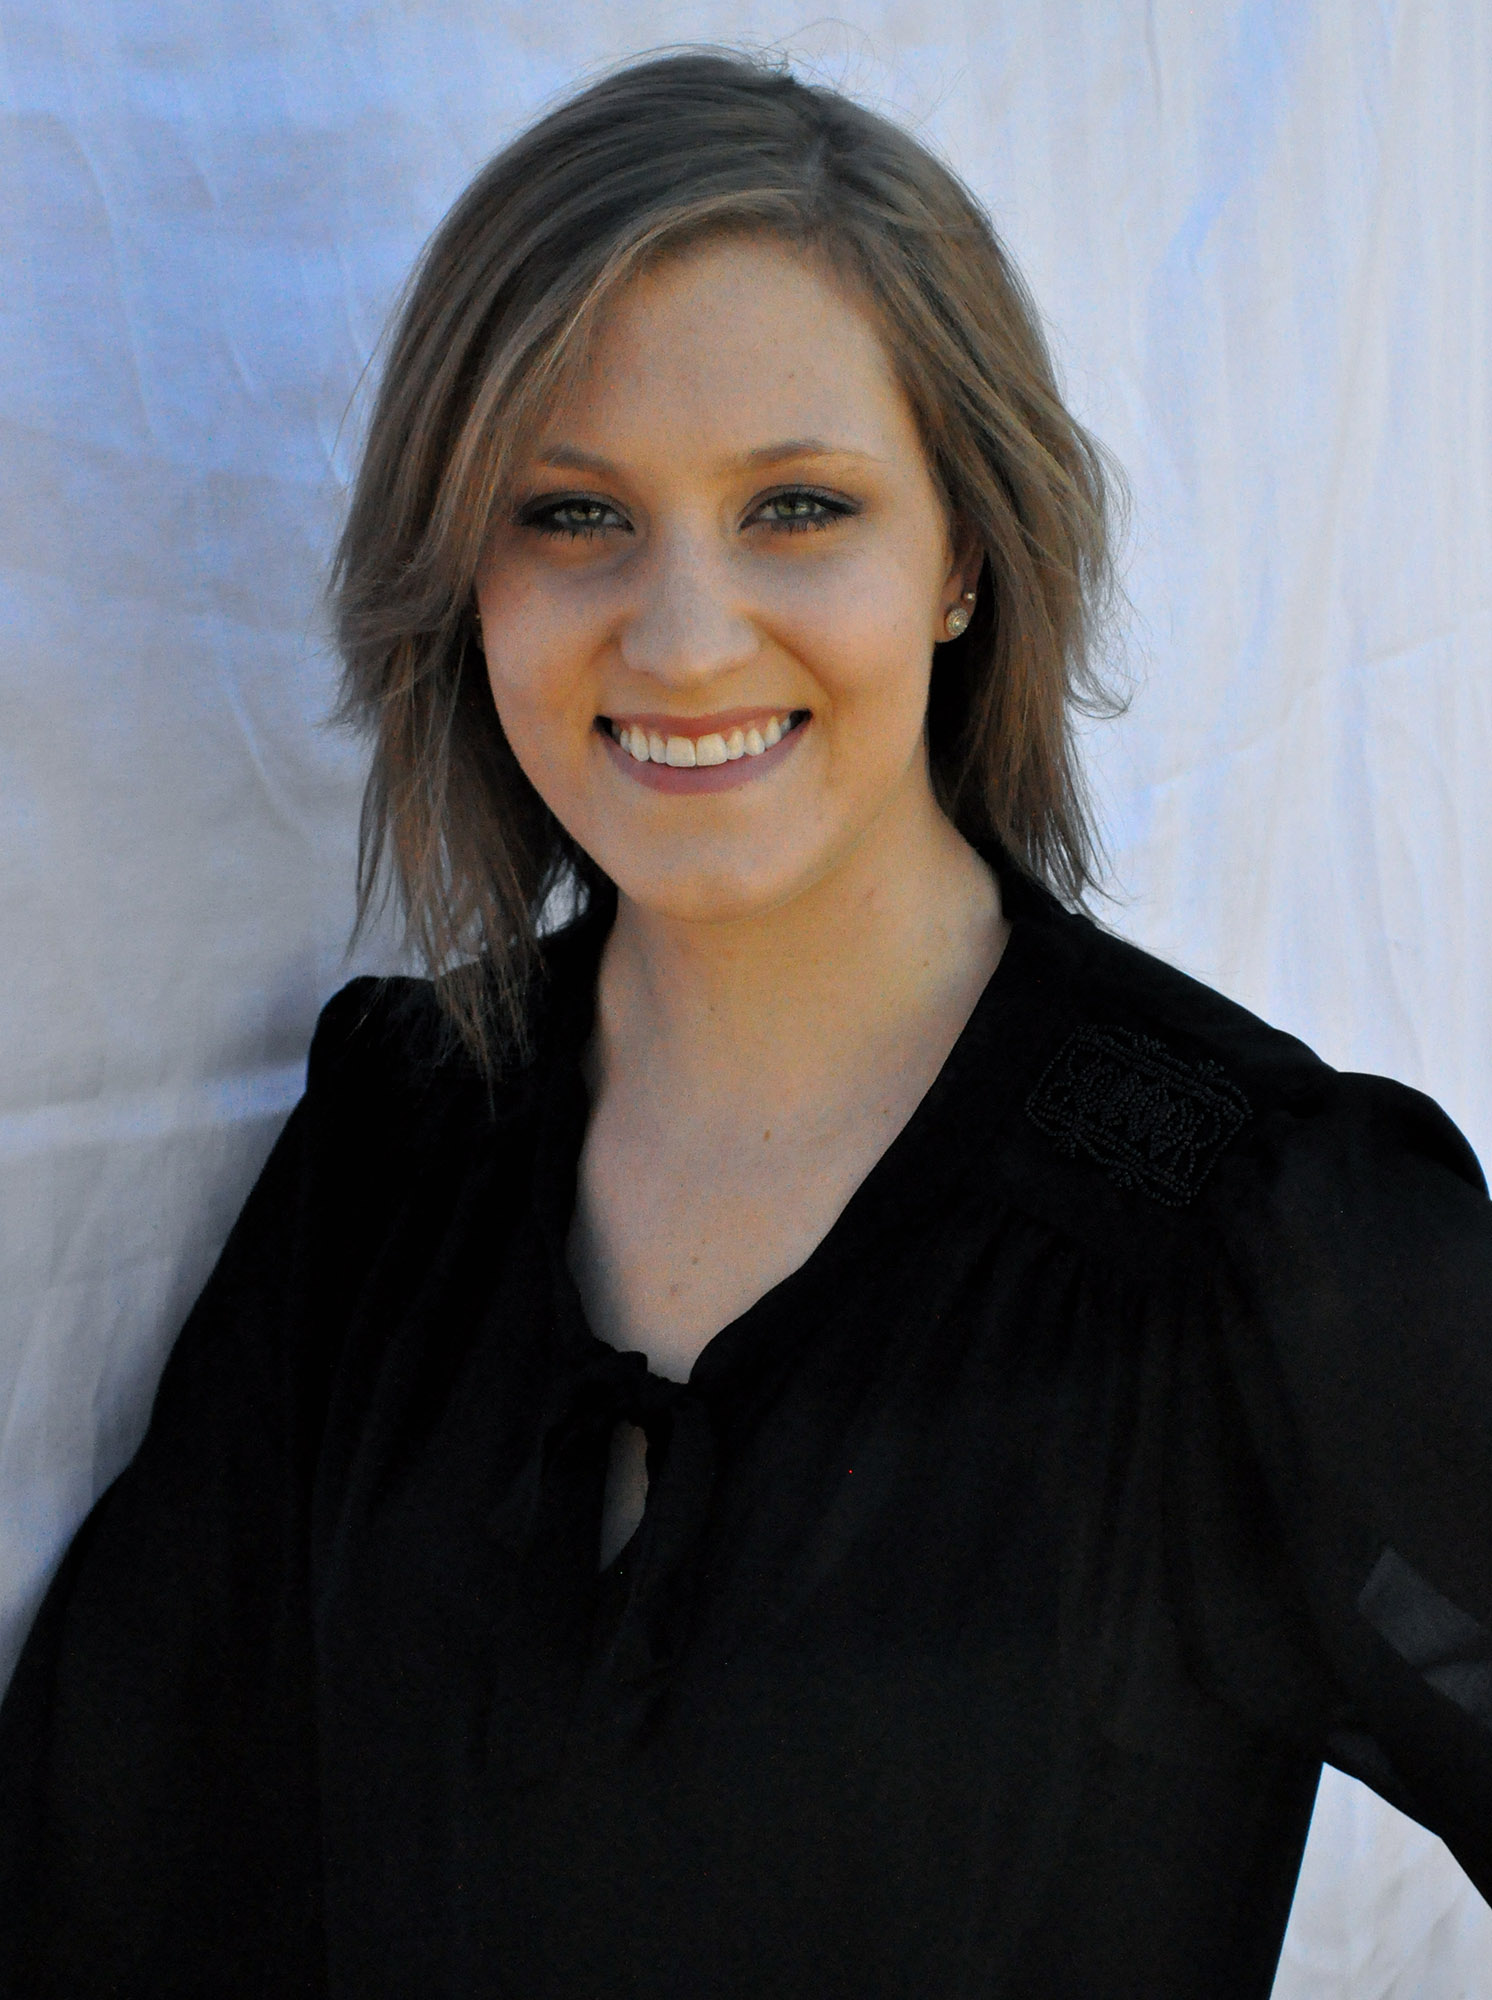 Hannah Kostelecky